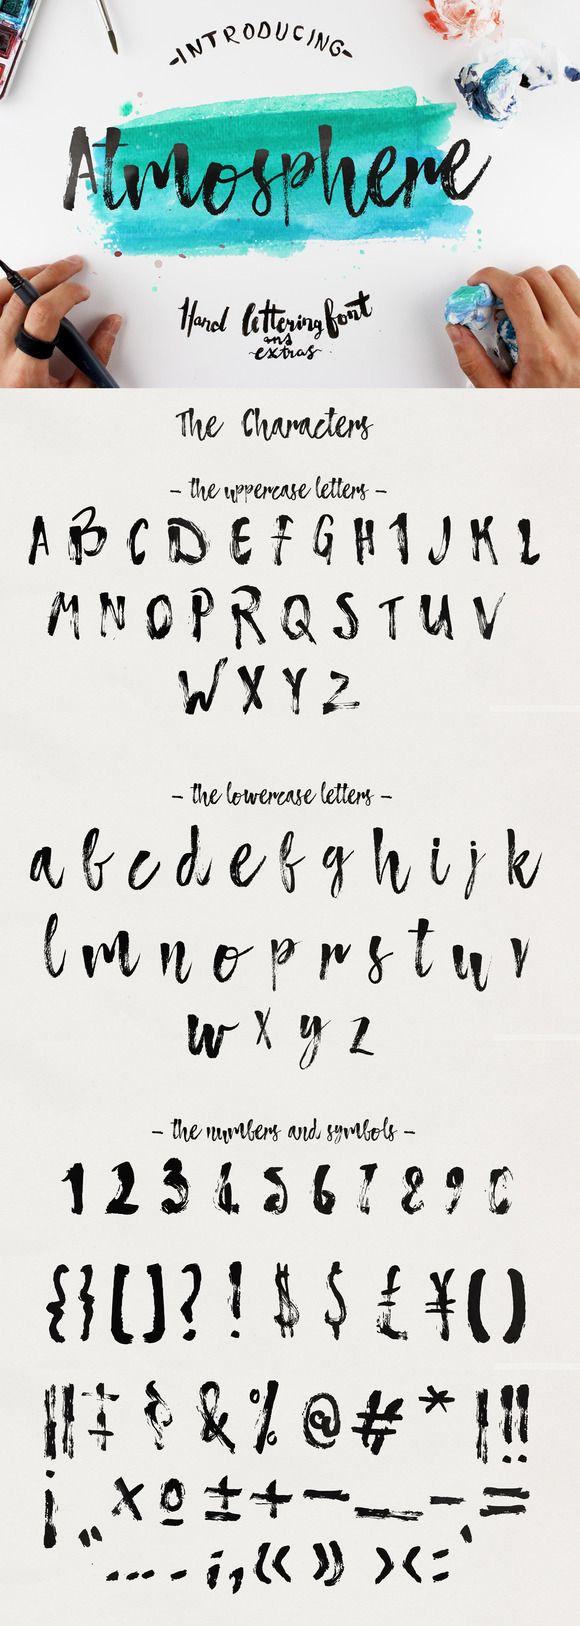 Atmosphere Script Typeface by Yasir Ekinci on Creative Market